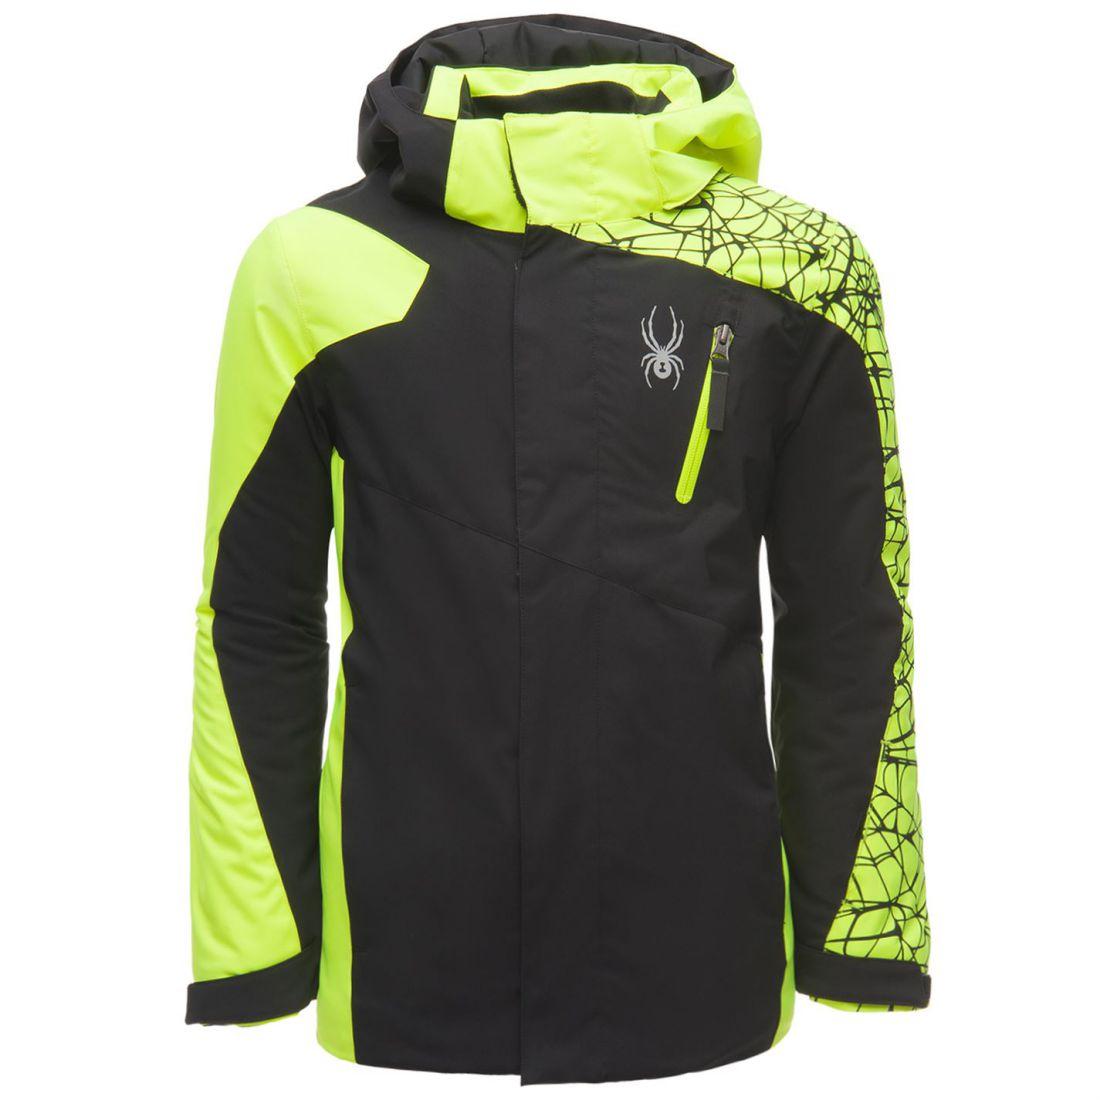 Spyder Kids Boys Guard Jkt Juniors Ski Jacket Coat Top